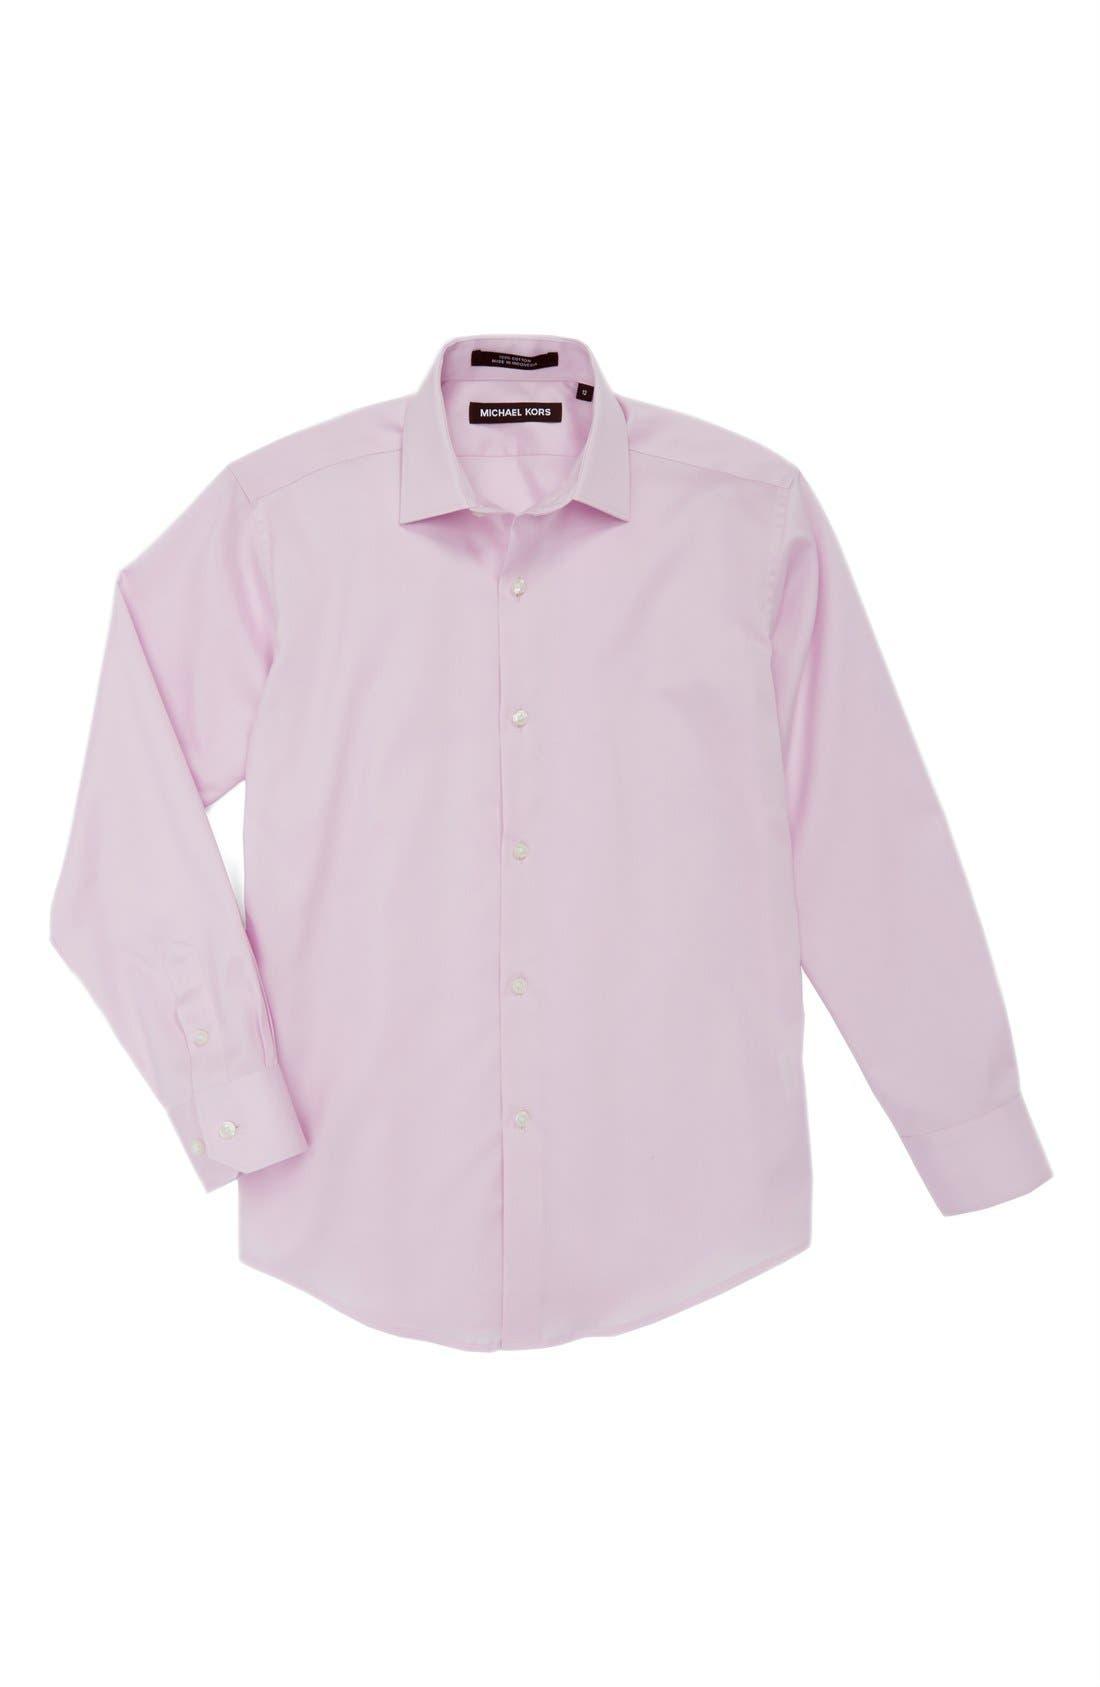 MICHAEL KORS,                             Woven Cotton Dress Shirt,                             Main thumbnail 1, color,                             ROSE